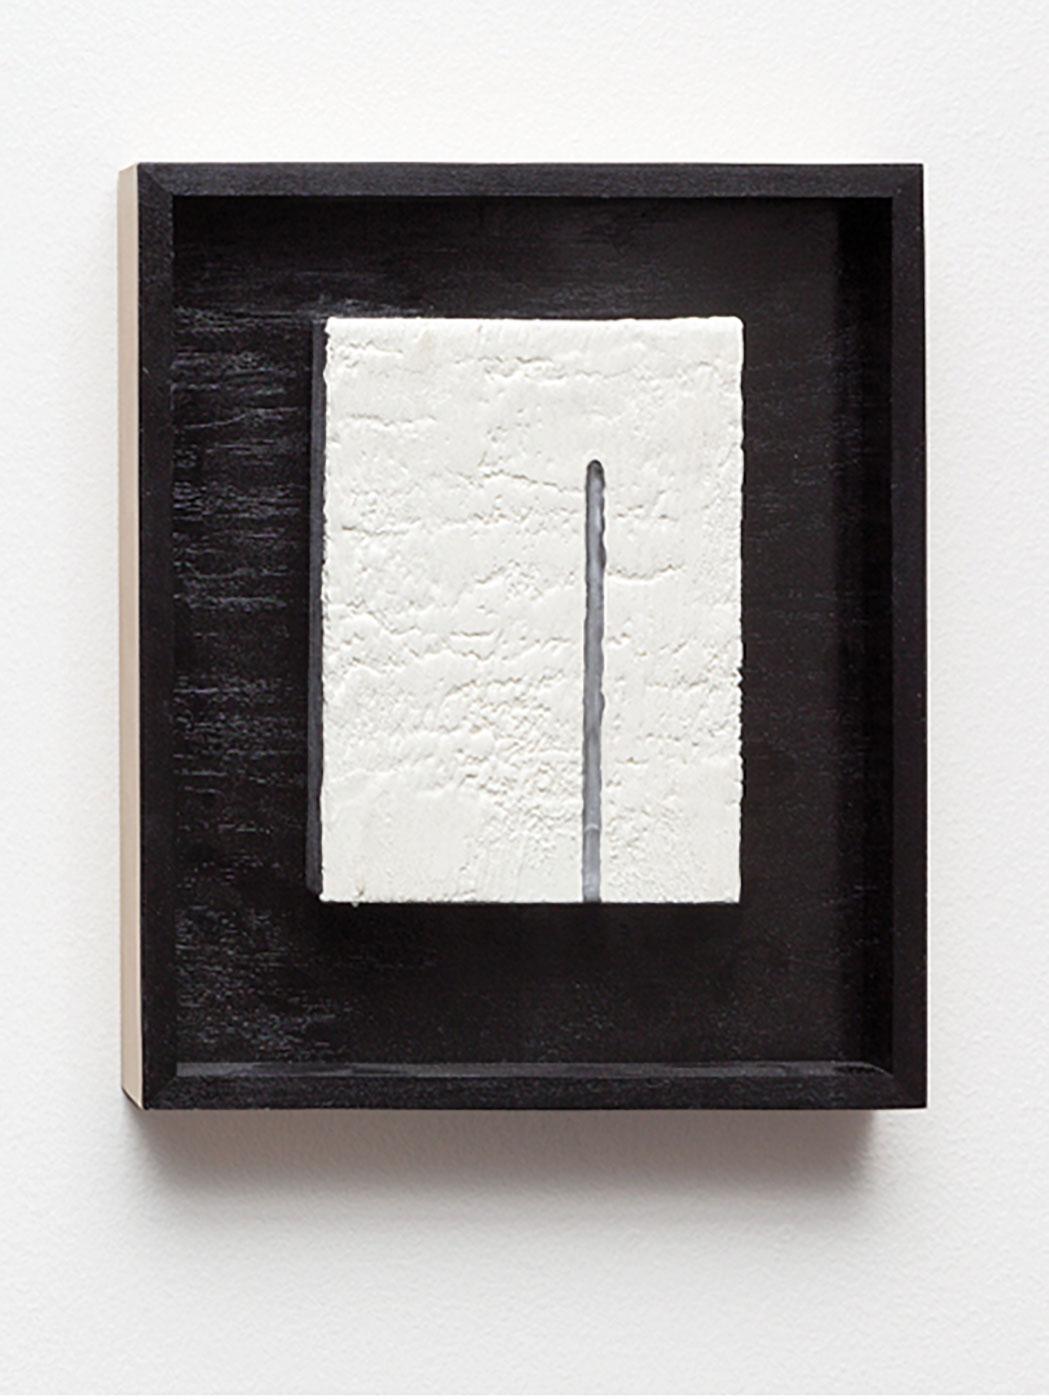 David Cavaliero - Untitled (Portrait)